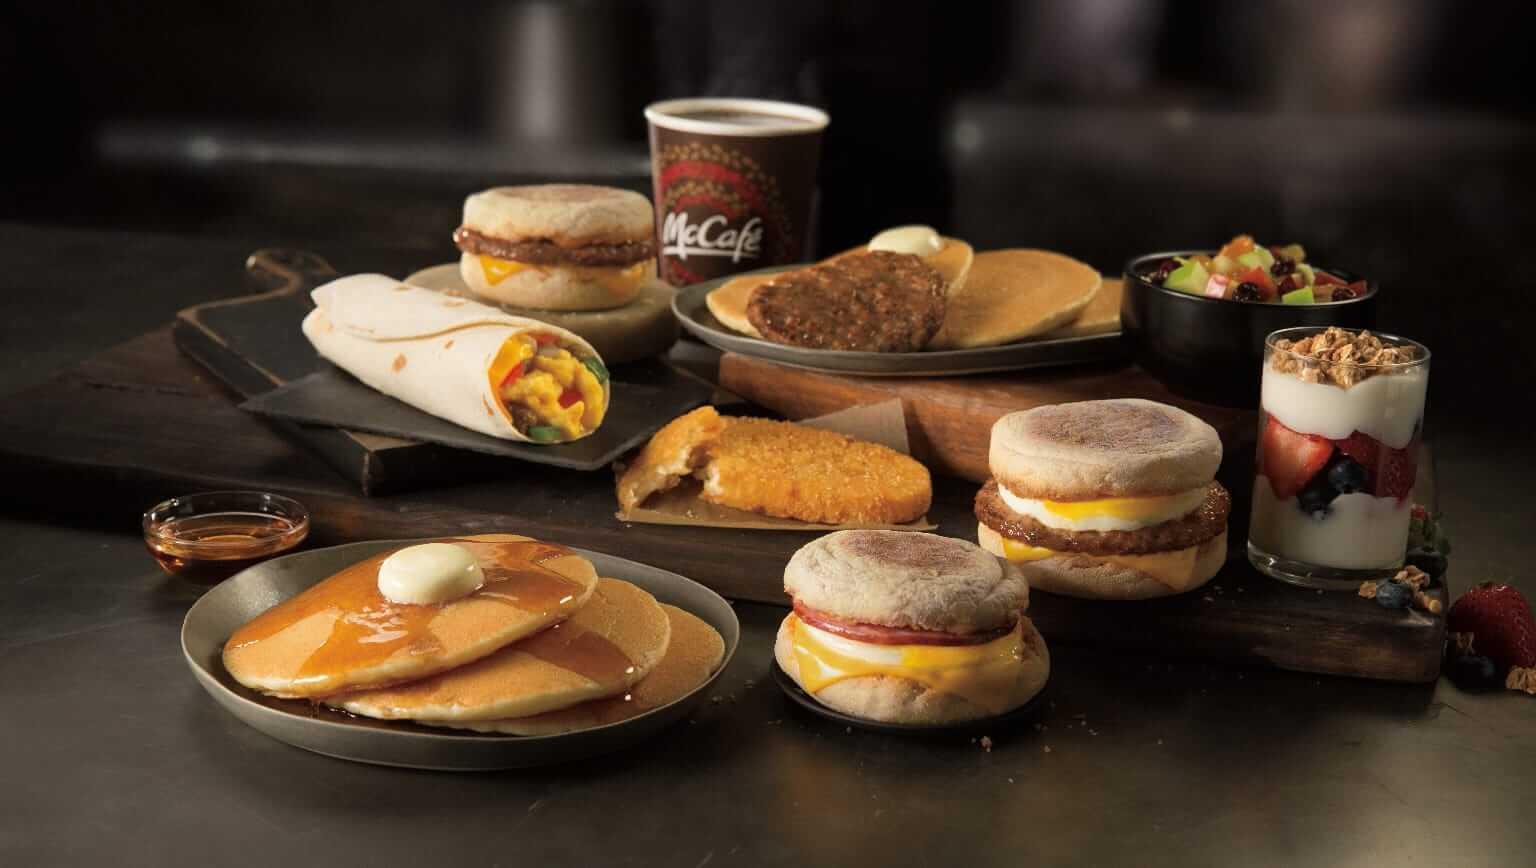 When Does McDonald's Stop Serving Breakfast